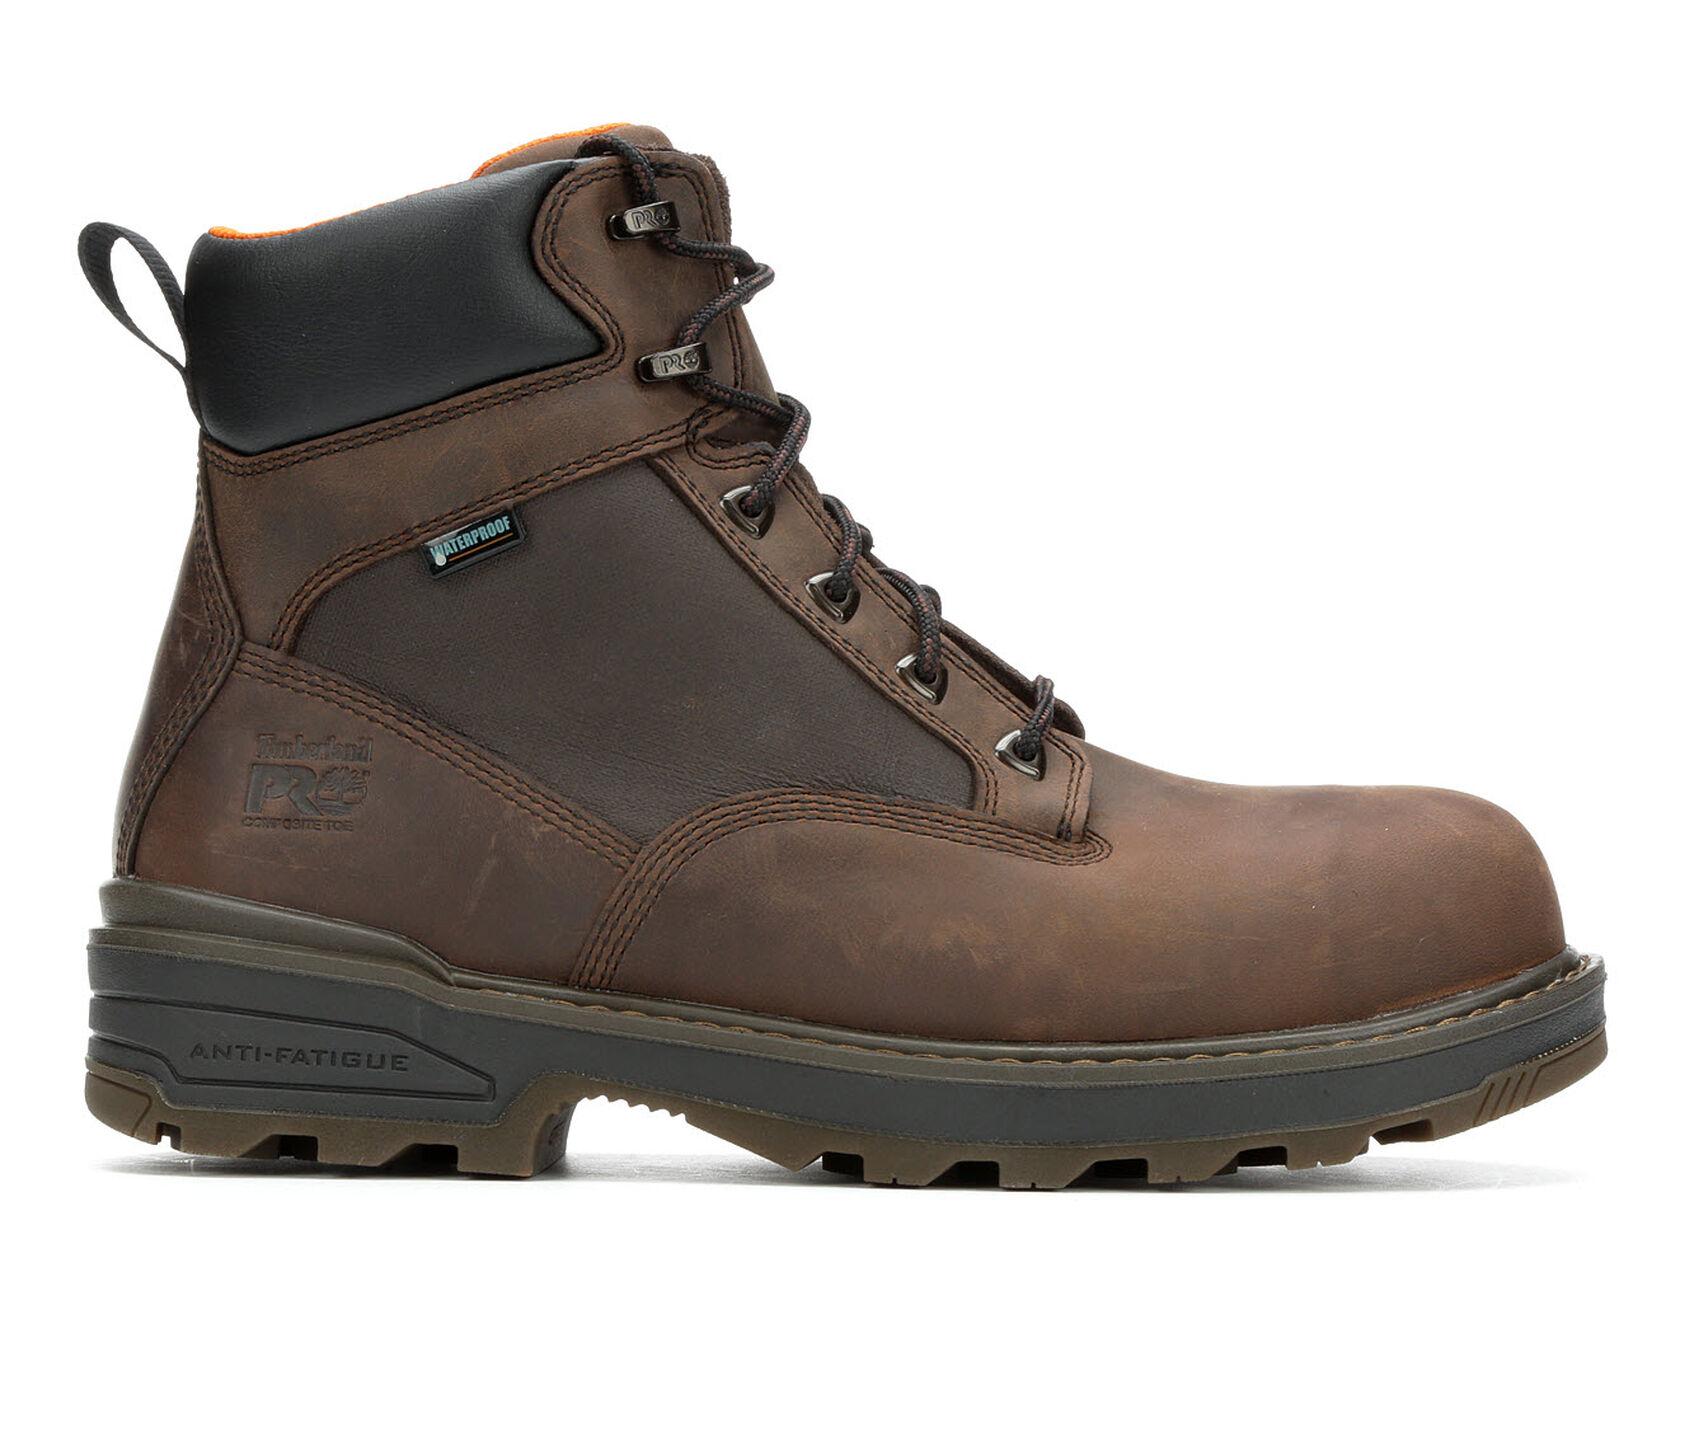 8c2b19673b0 Men's Timberland Pro Resistor A121S Composite Toe Waterproof Work Boots